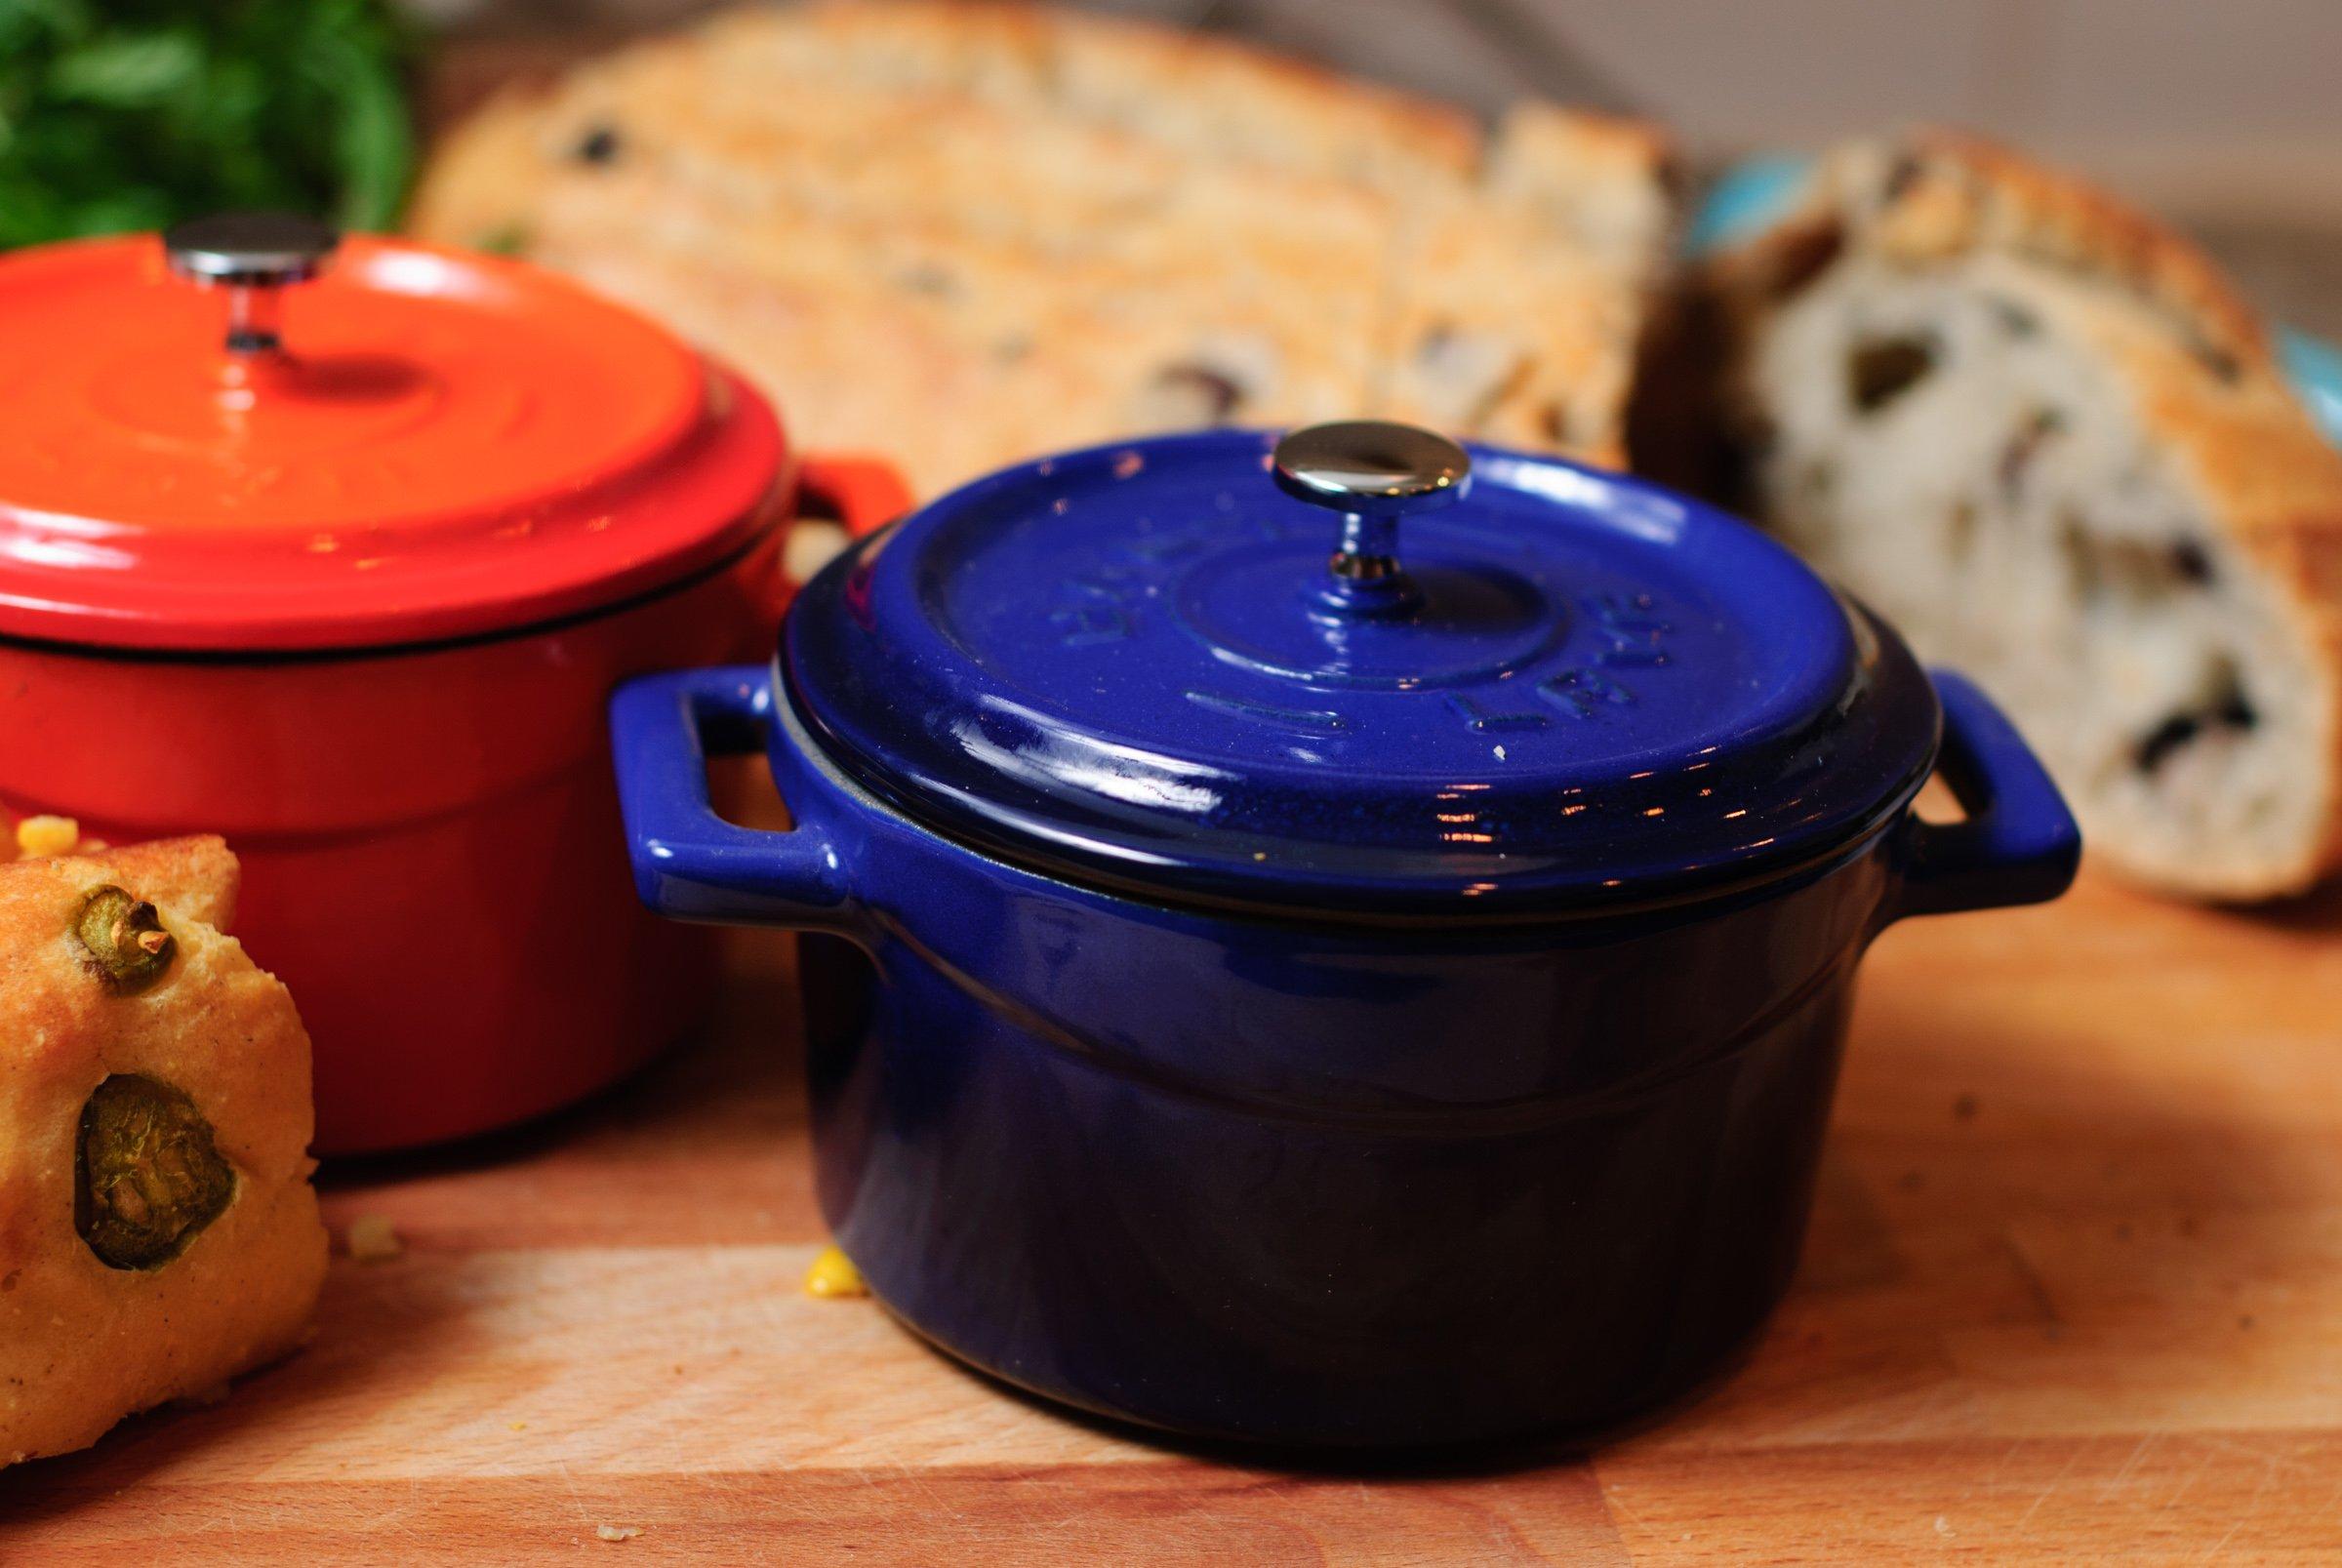 Lava Signature Enameled Cast-Iron Mini Dutch Oven - 12 ounce, Cobalt Blue by Lava Cookware (Image #2)